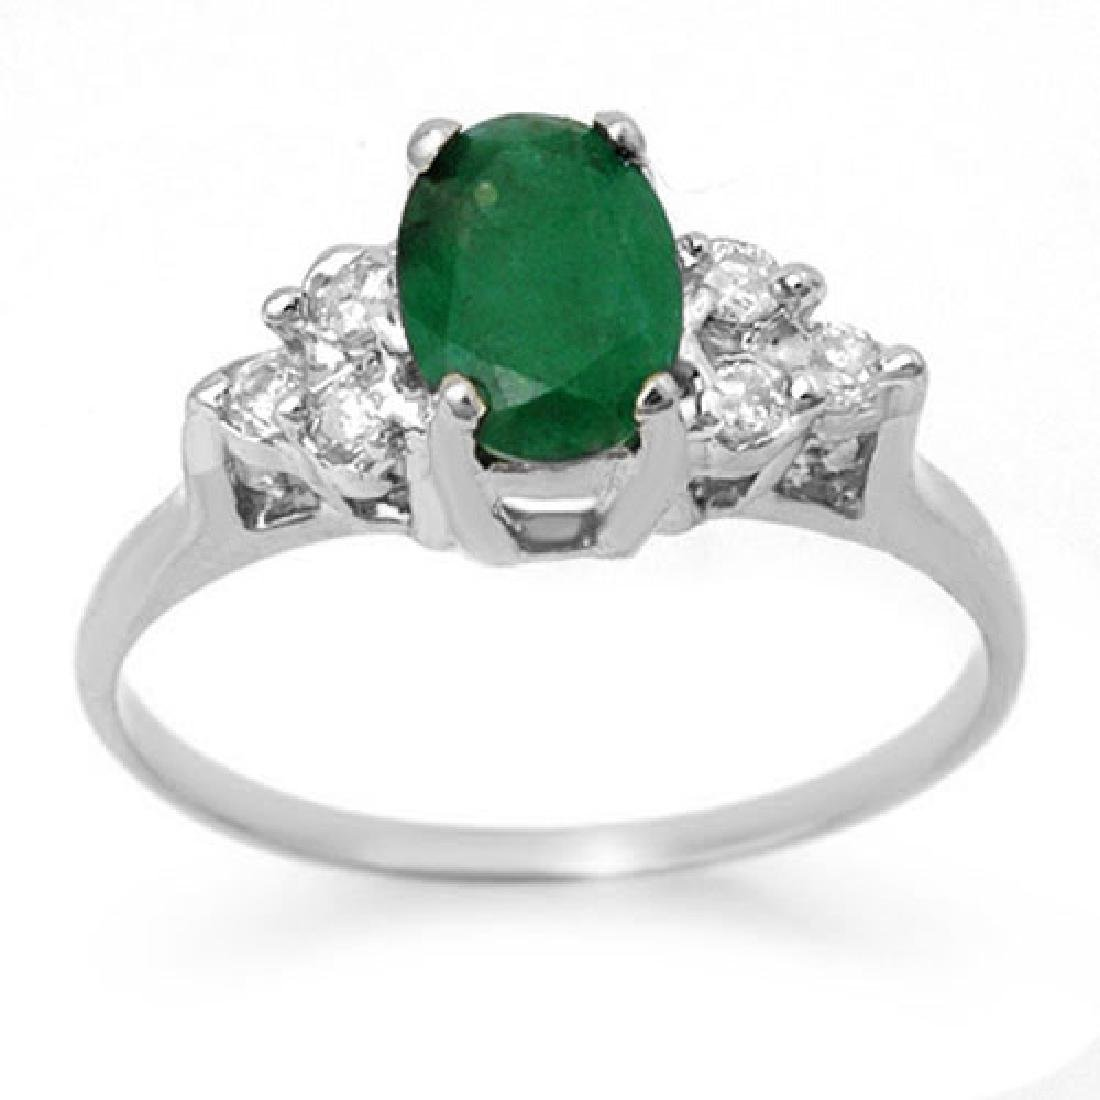 1.18 CTW Emerald & Diamond Ring 18K White Gold